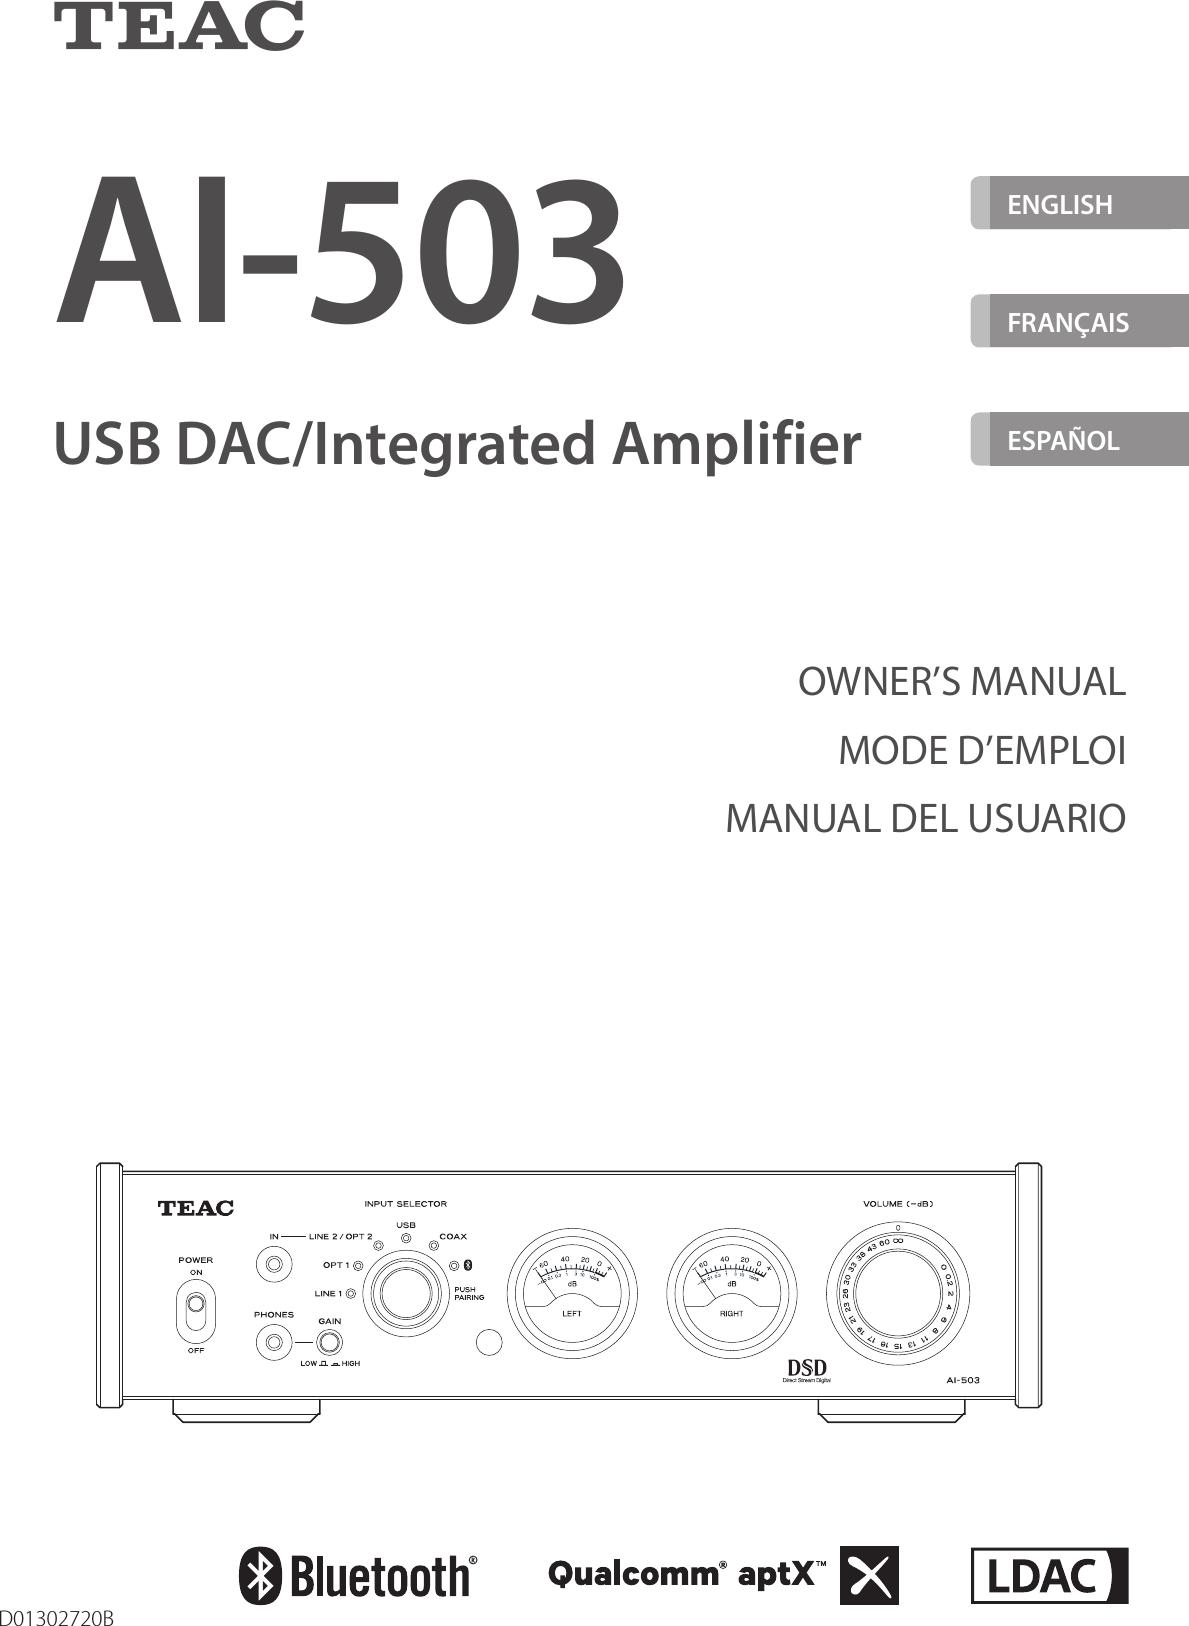 teac ai503 usb dac integrated amplifier user manual rh usermanual wiki Online User Guide teac tv user guide